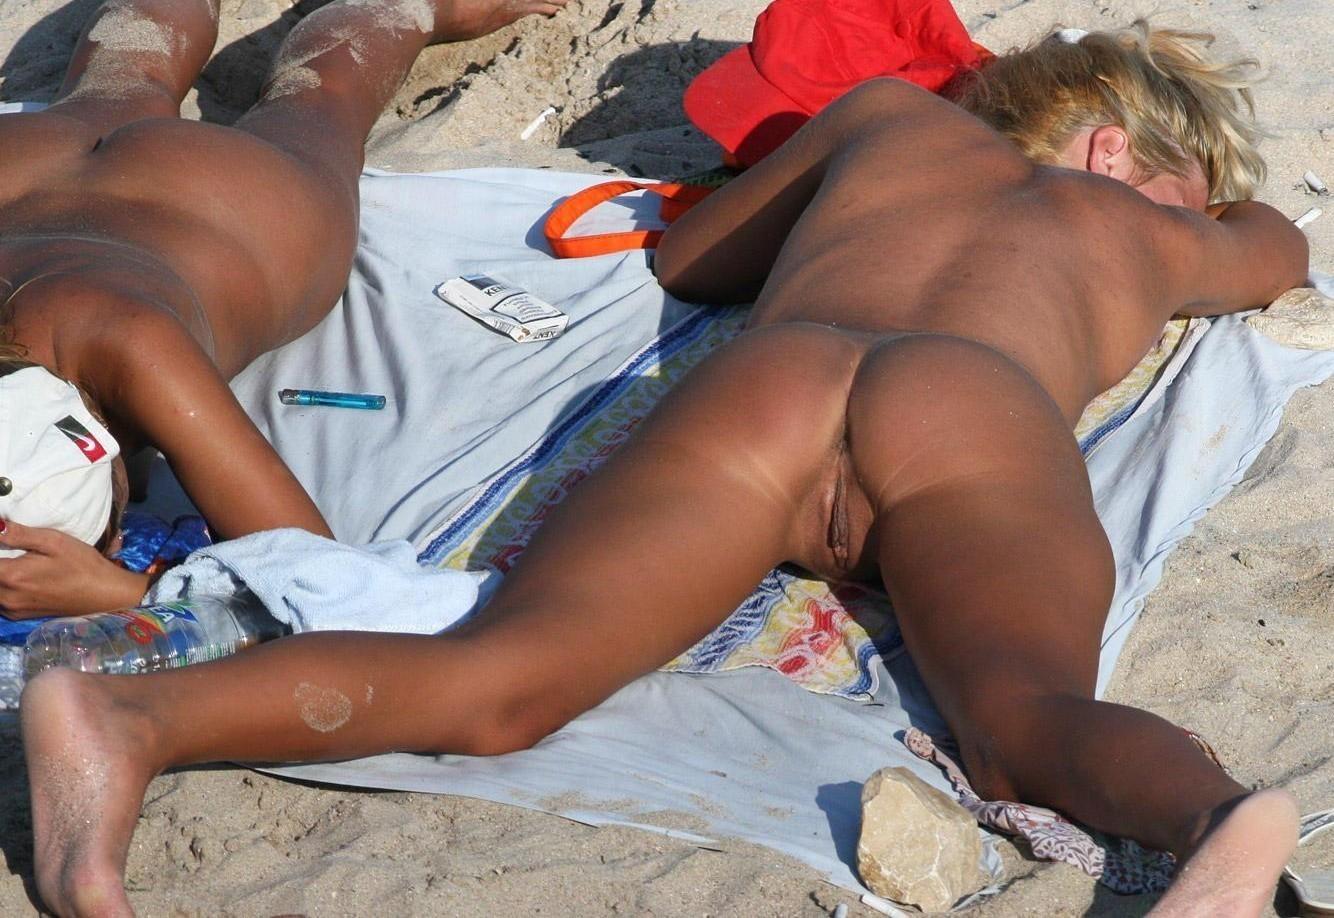 Milfs naked beach pics